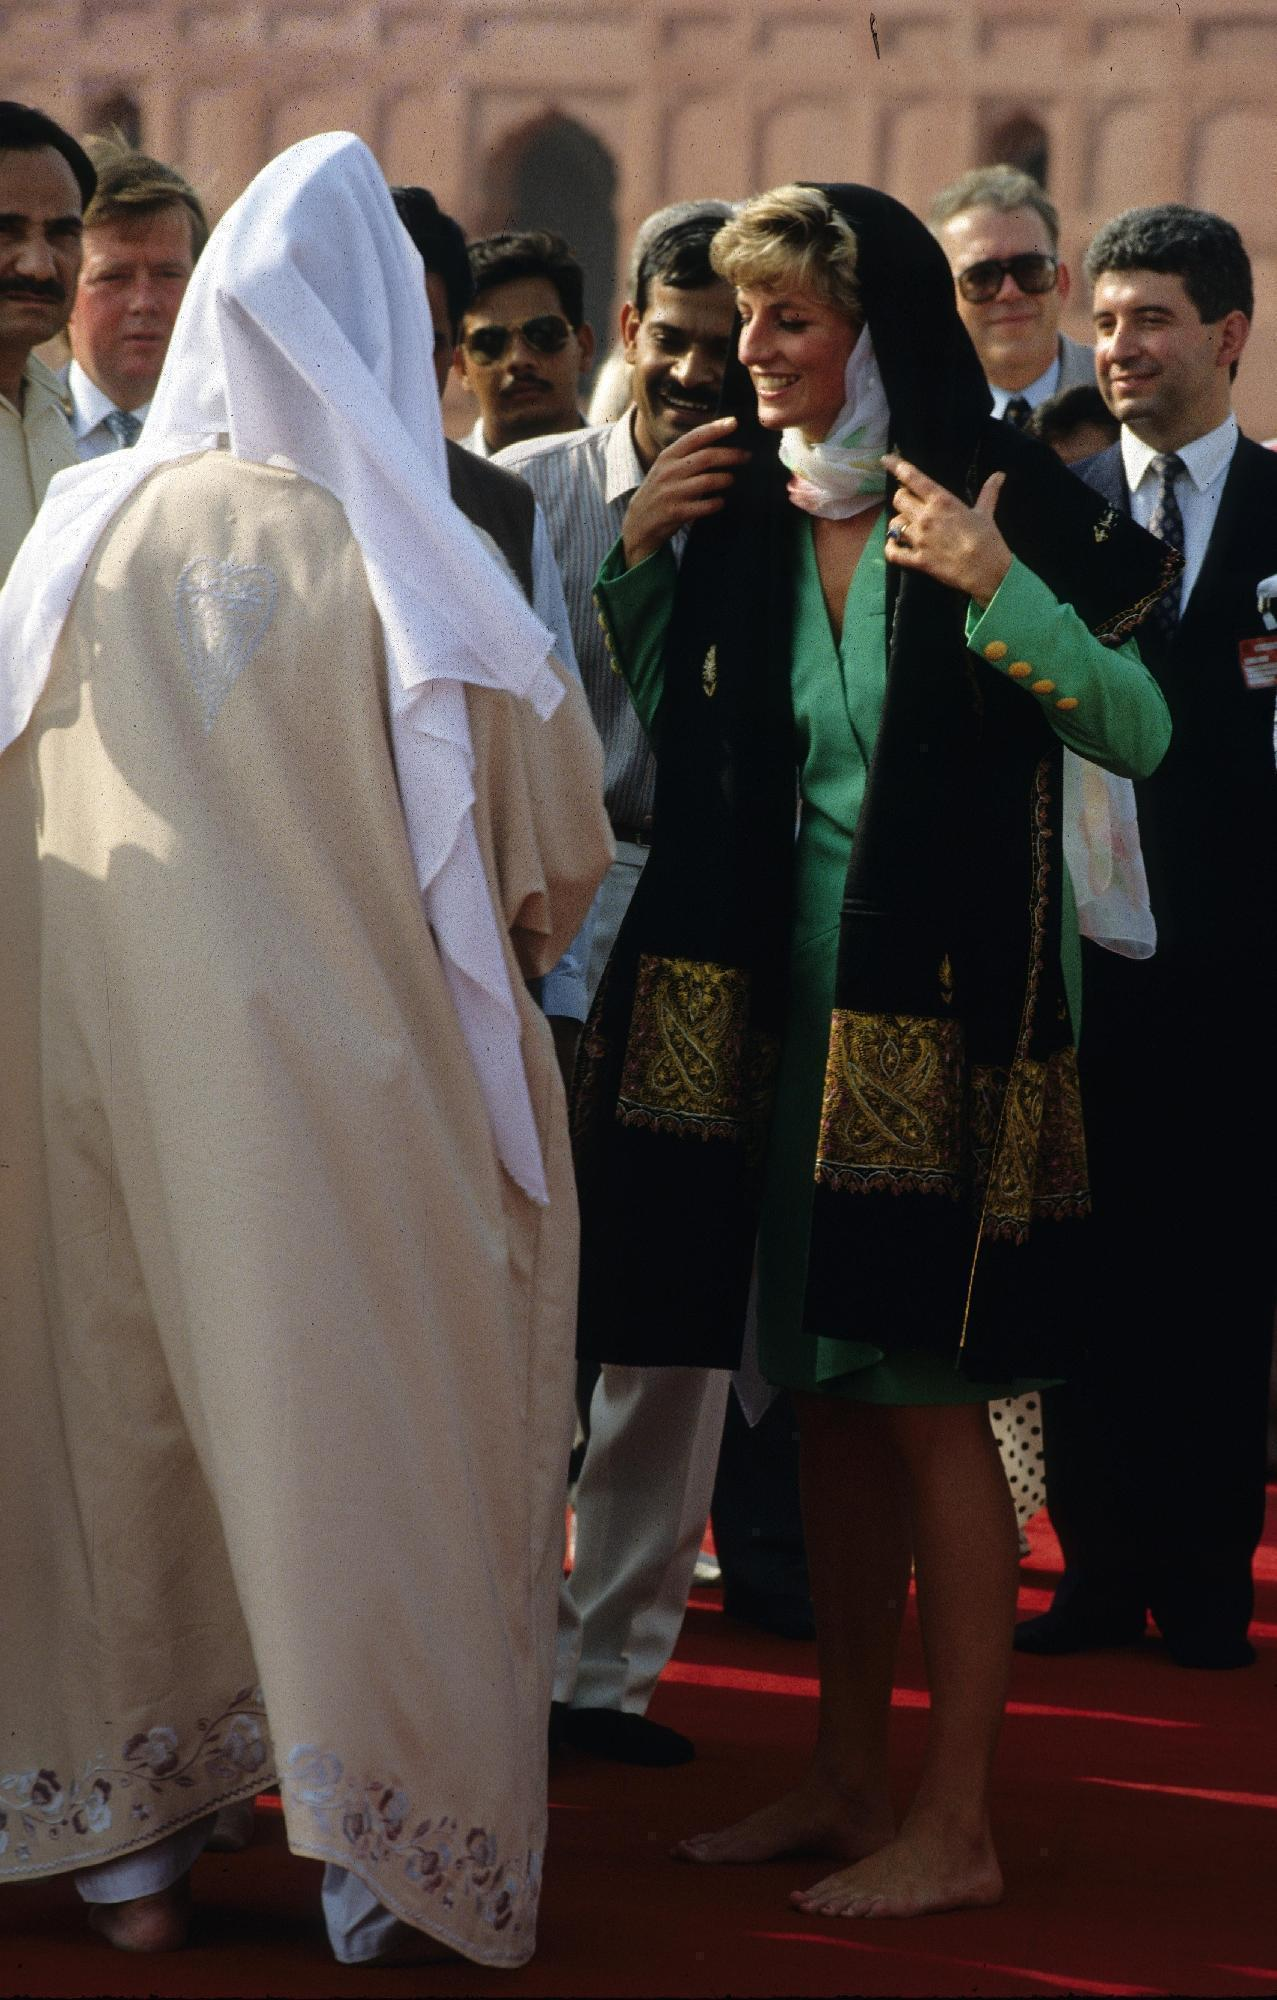 https://pics.wikifeet.com/Princess-Diana-Feet-2694703.jpg